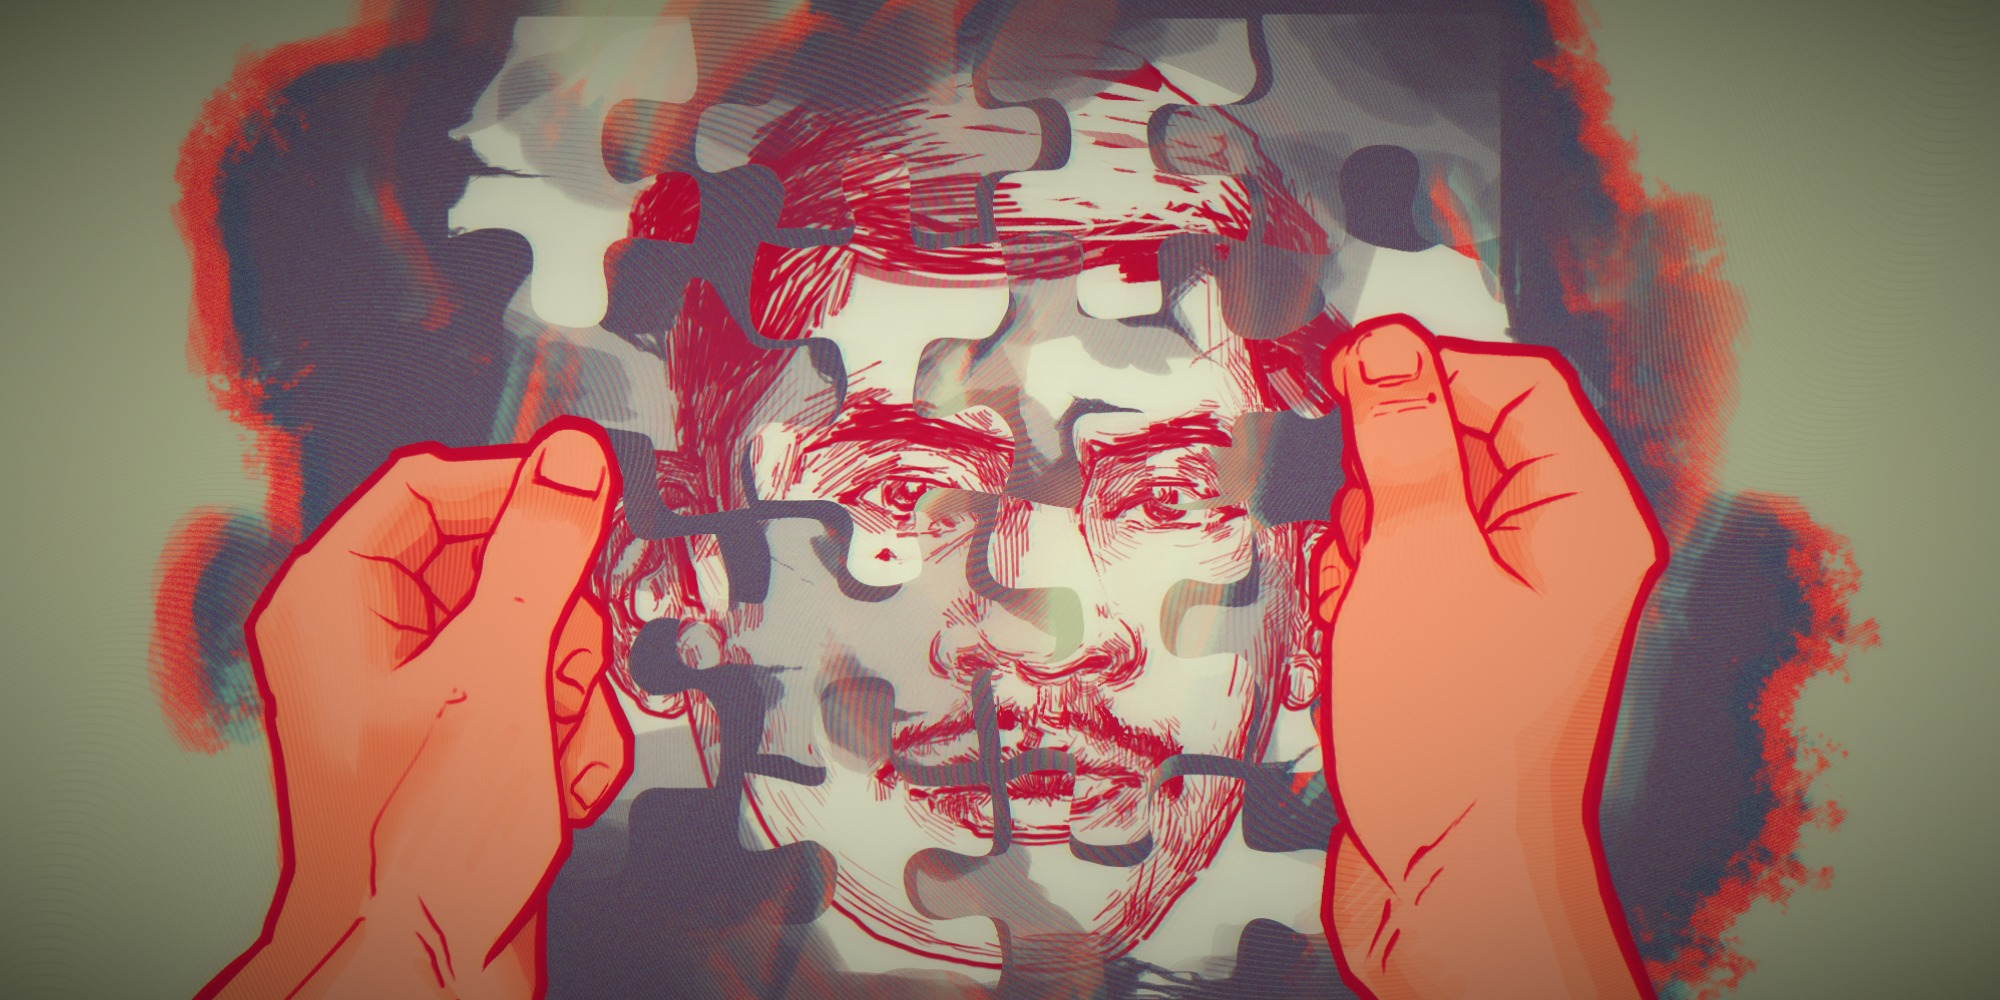 madres-desaparecidos-muerta-feminicidios-ayotzinapa-jalisco-mexico